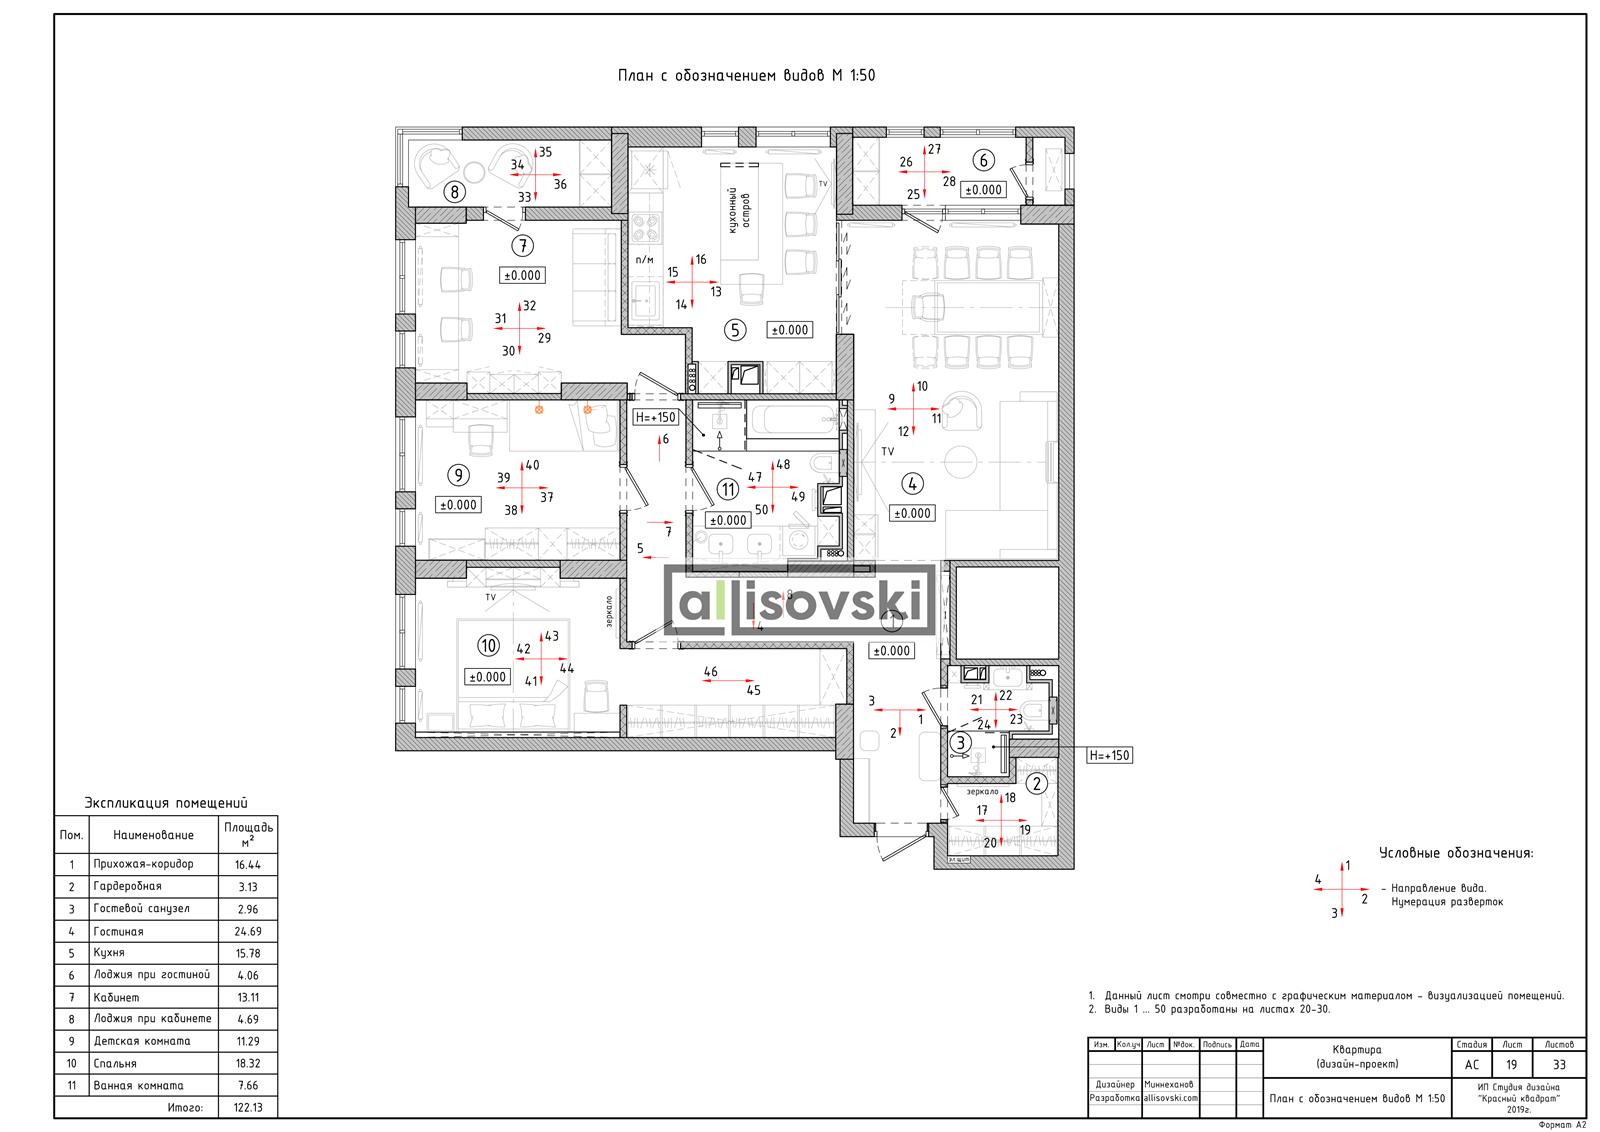 Виды на плане квартиры